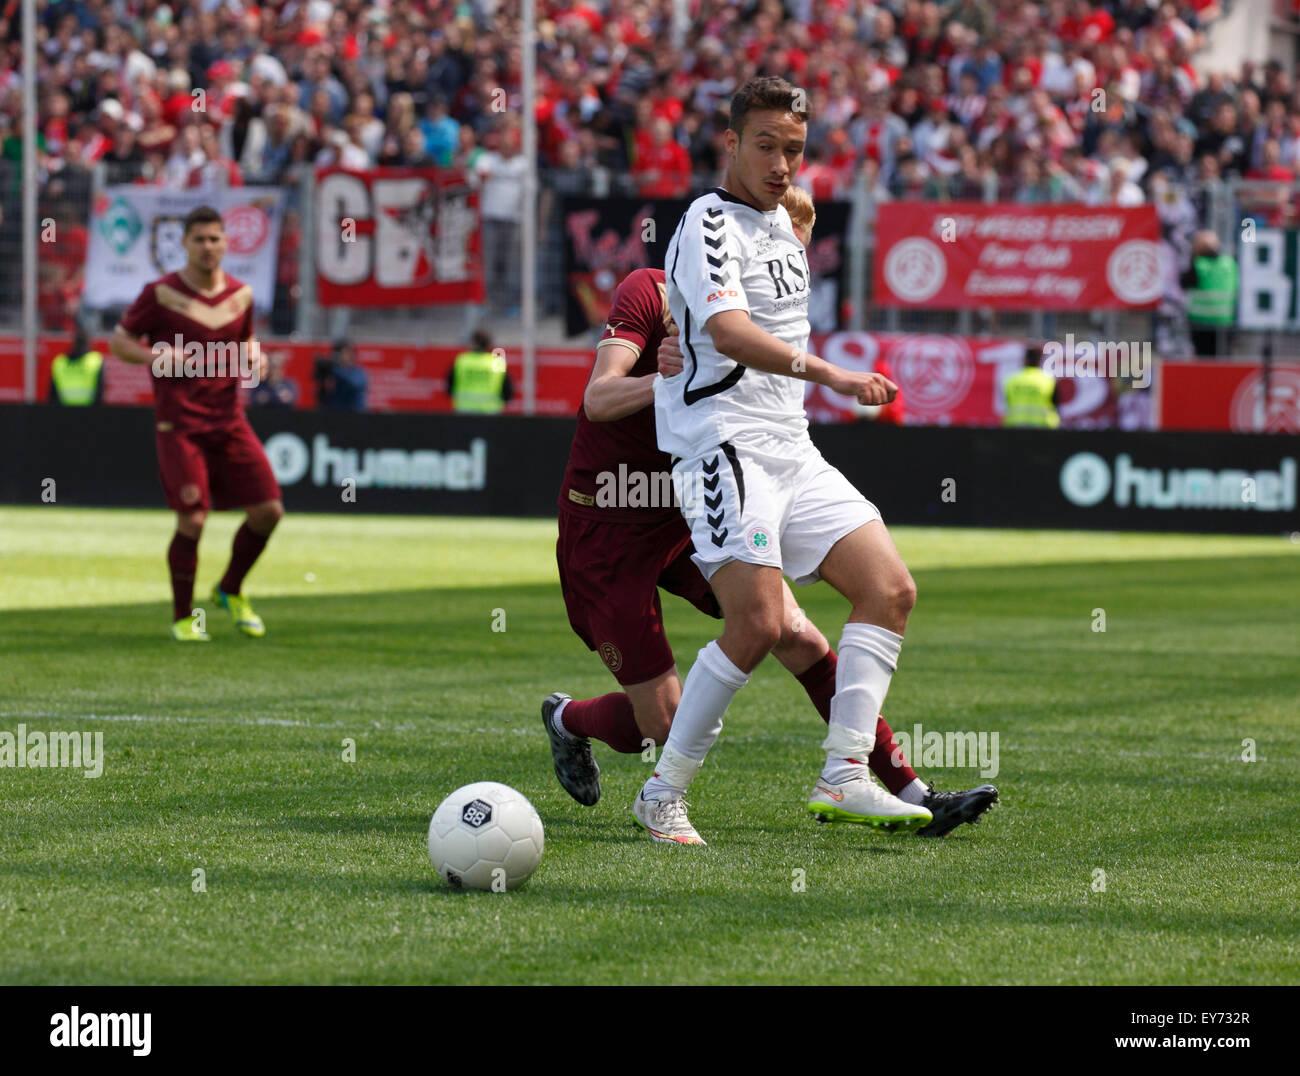 sports, football, Lower Rhine Cup, 2014/2015, final, Rot Weiss Essen versus Rot Weiss Oberhausen 6:5 on penalties, - Stock Image